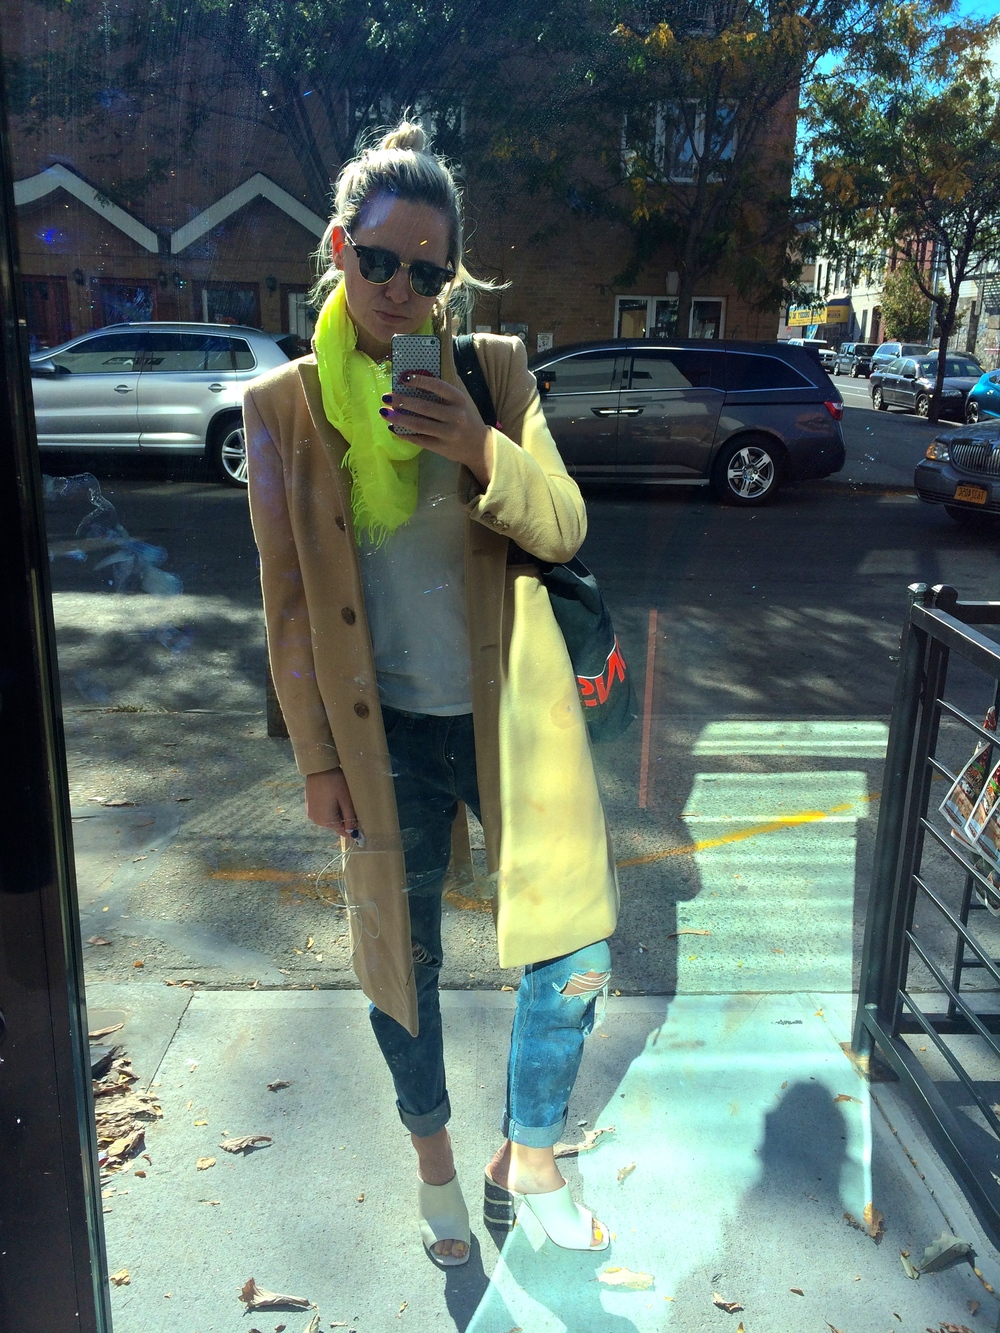 Scarf + White Tee + Camel Coat: J.Crew; Boyfriend Jeans: Rag + Bone; Mule Sandals: Cole Haan; Sunglasses: Ray Ban